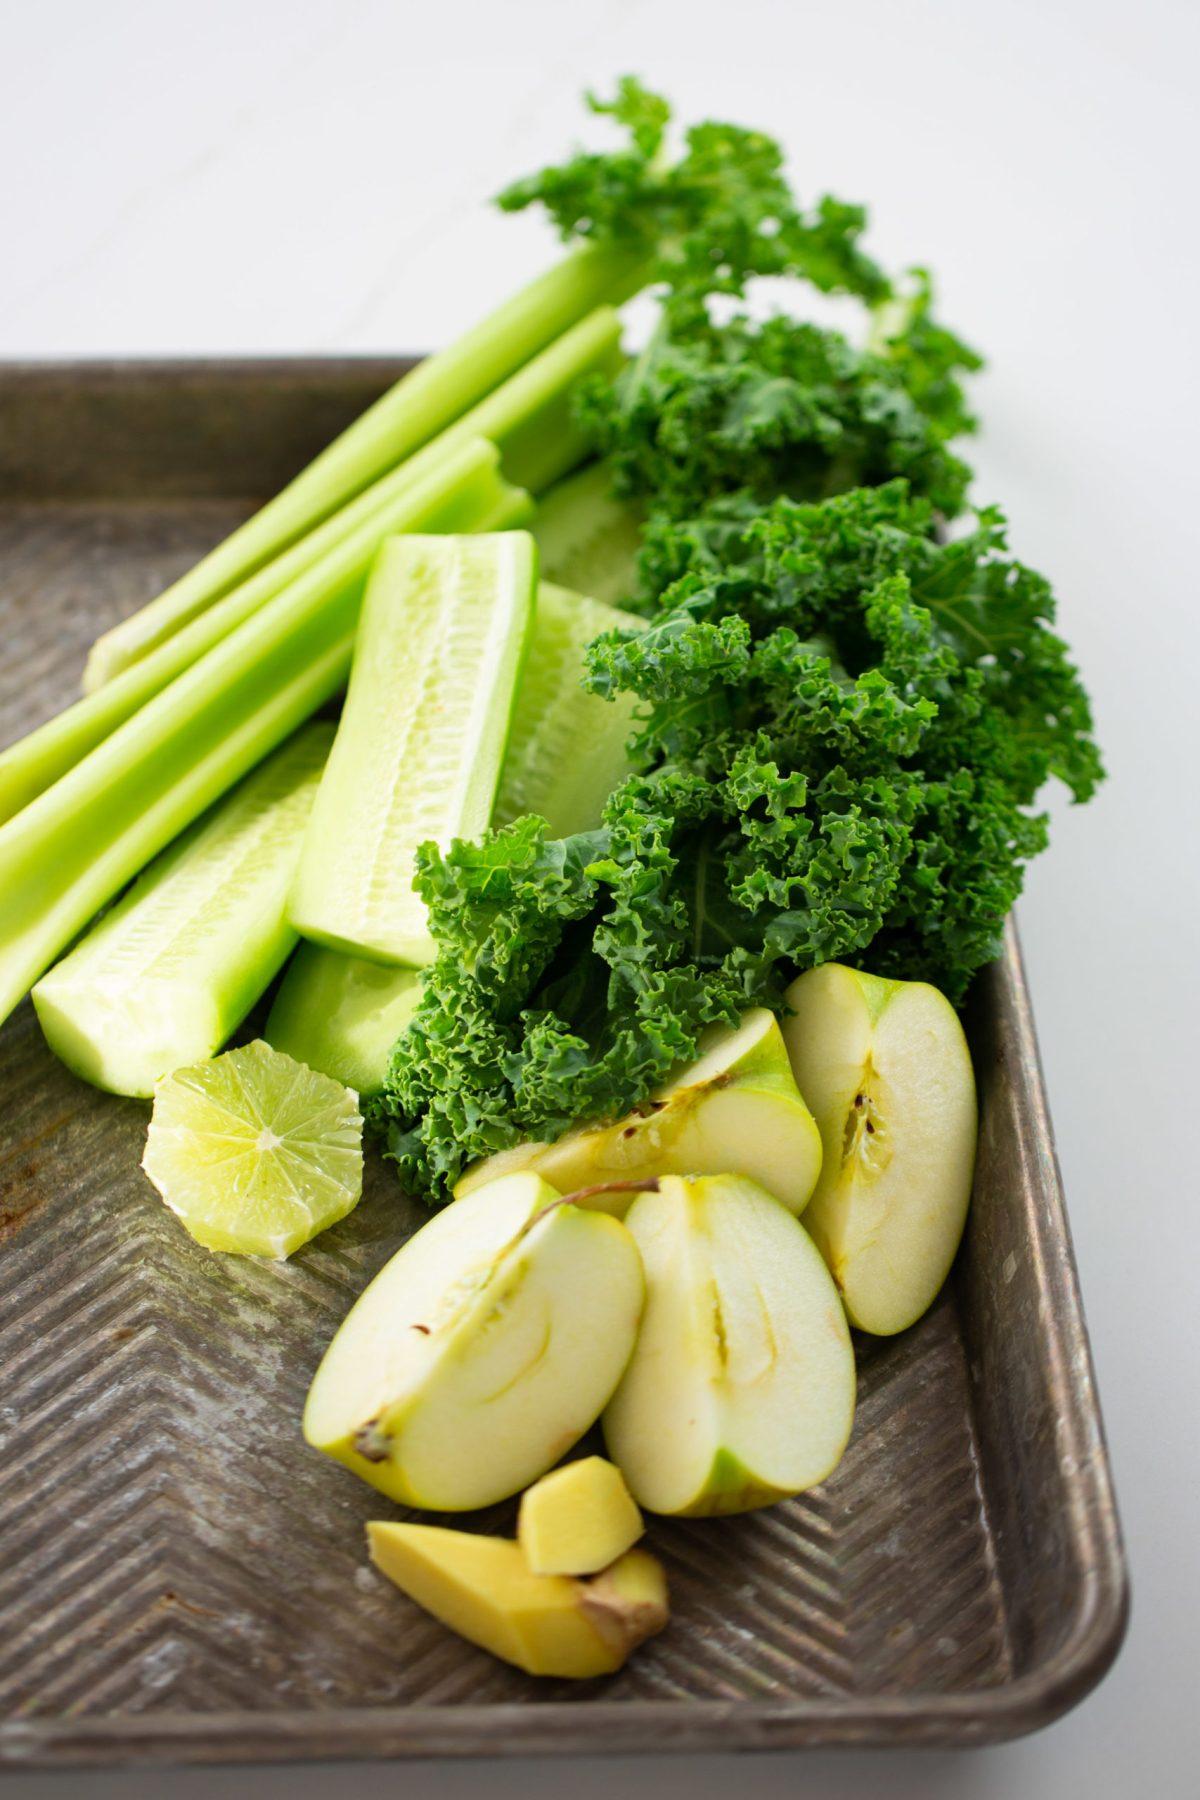 ingredientes para hacer jugo verde